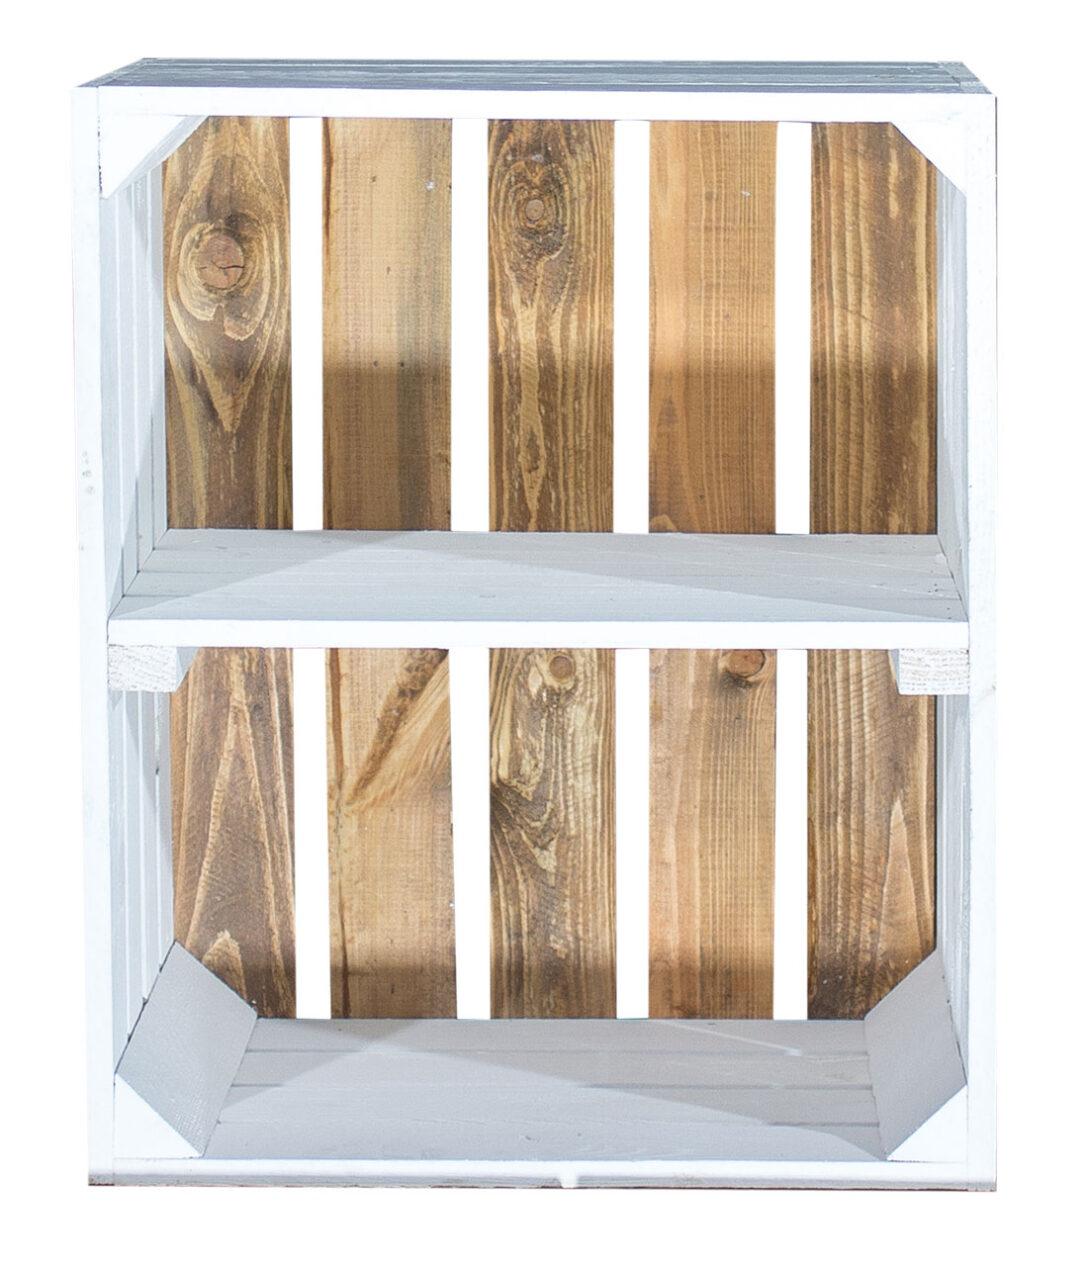 Large Size of Farbige Kisten Weies Regal Apfelkiste Weier Boden 50x40x30cm Schlafzimmer Raumteiler Wandregal Küche Regale Für Keller Landhausstil Dachschrägen Hängeregal Regal Kisten Regal